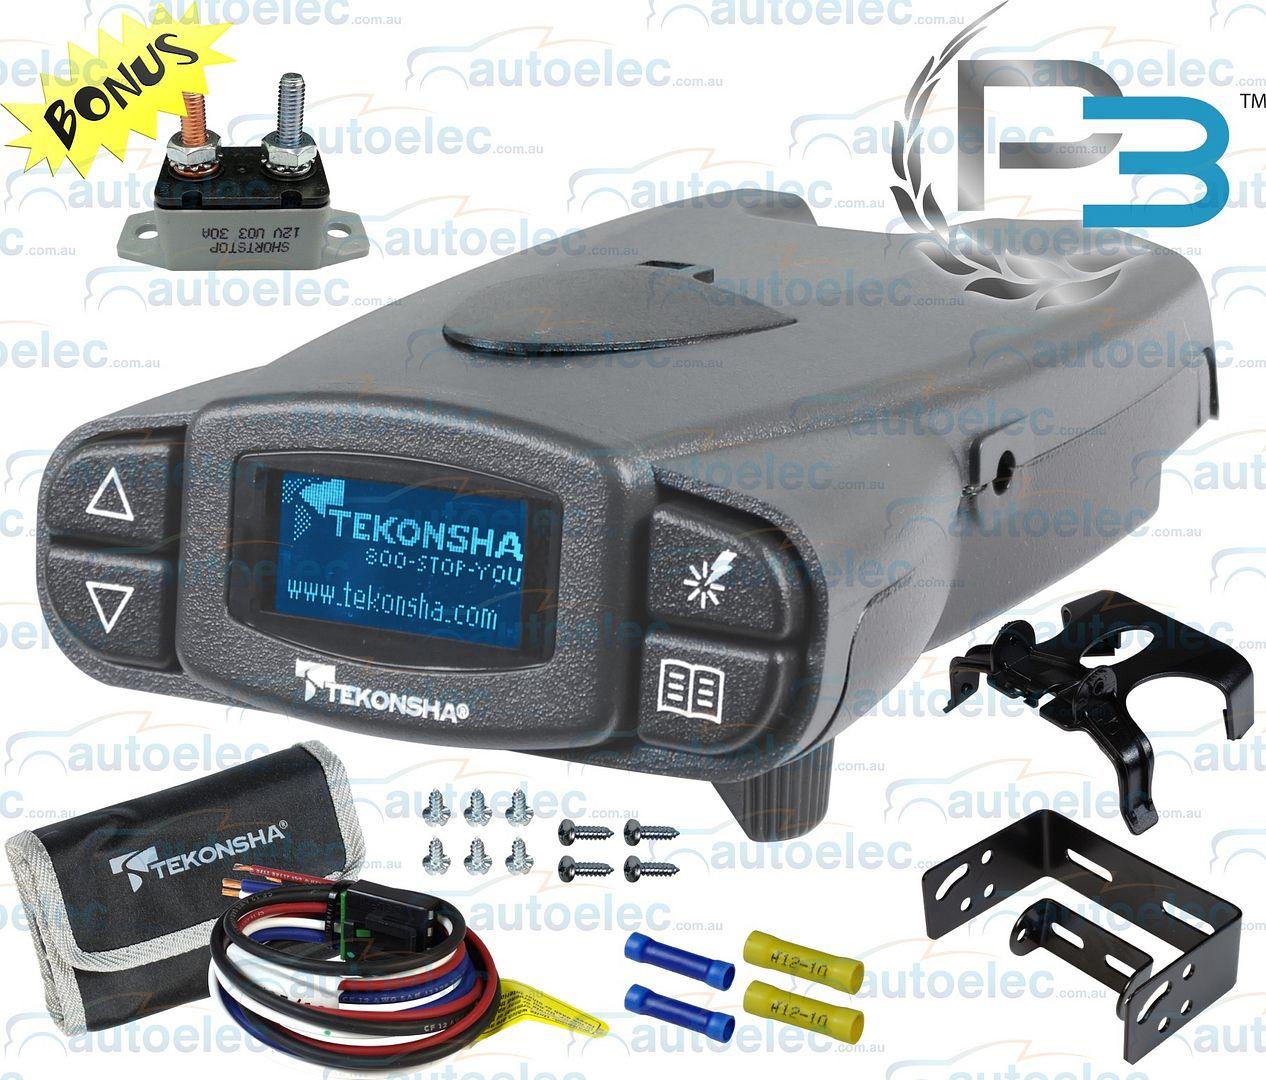 tekonsha prodigy p3 brake controller wiring diagram 1994 acura integra alarm